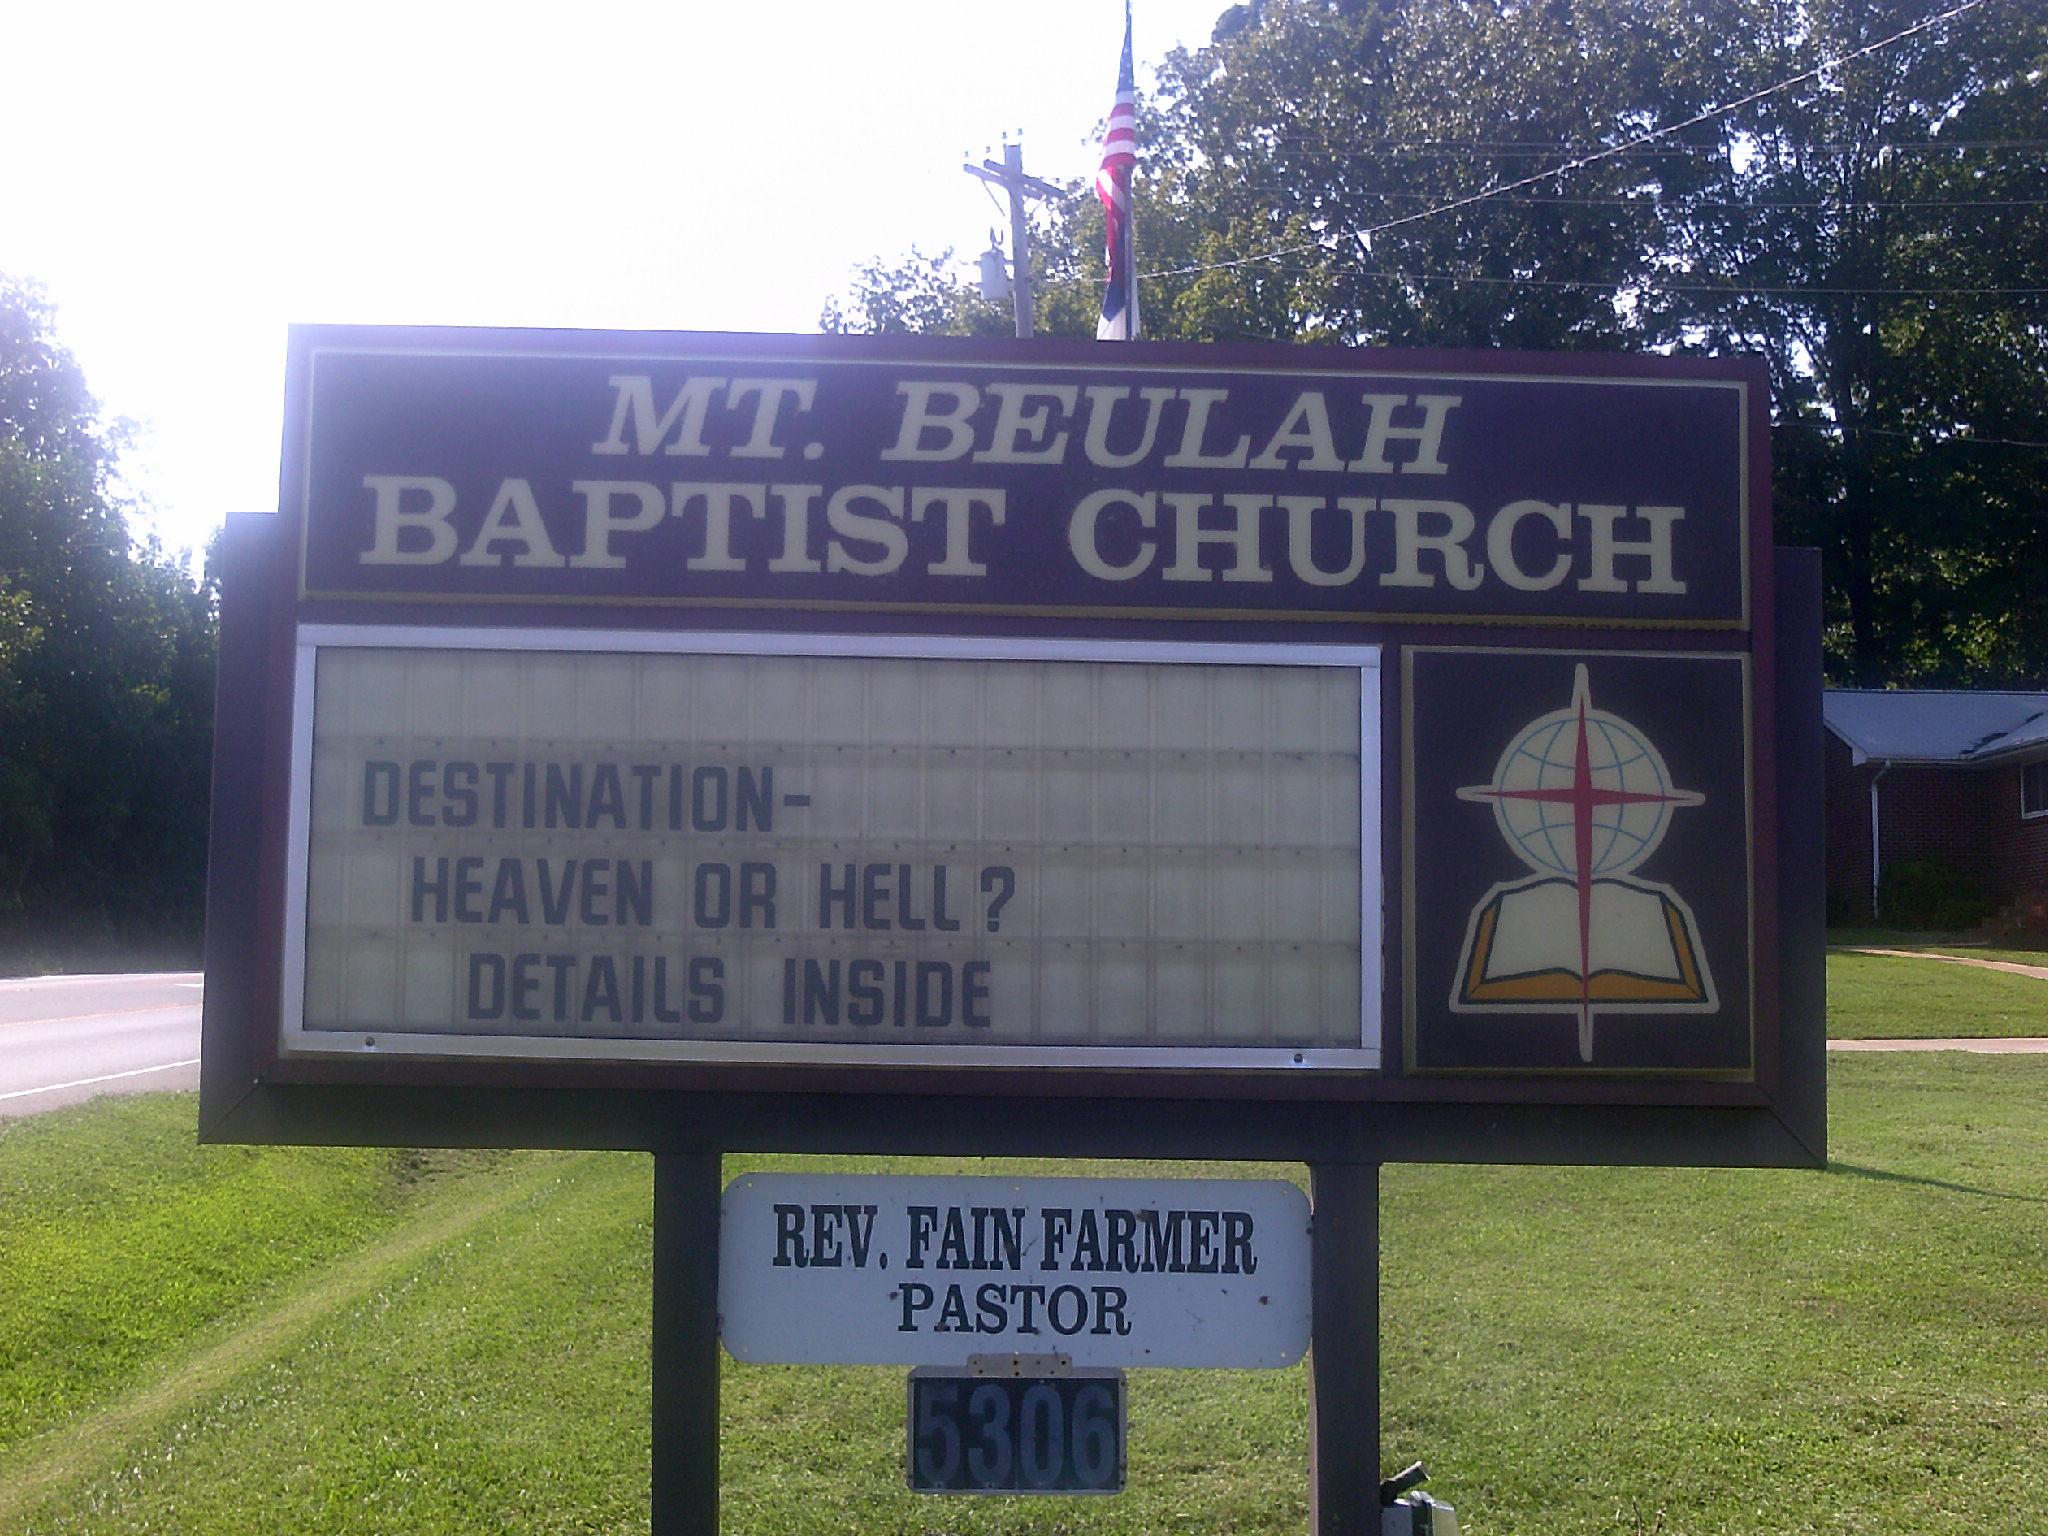 Mount Beulah Baptist Church Cemetery